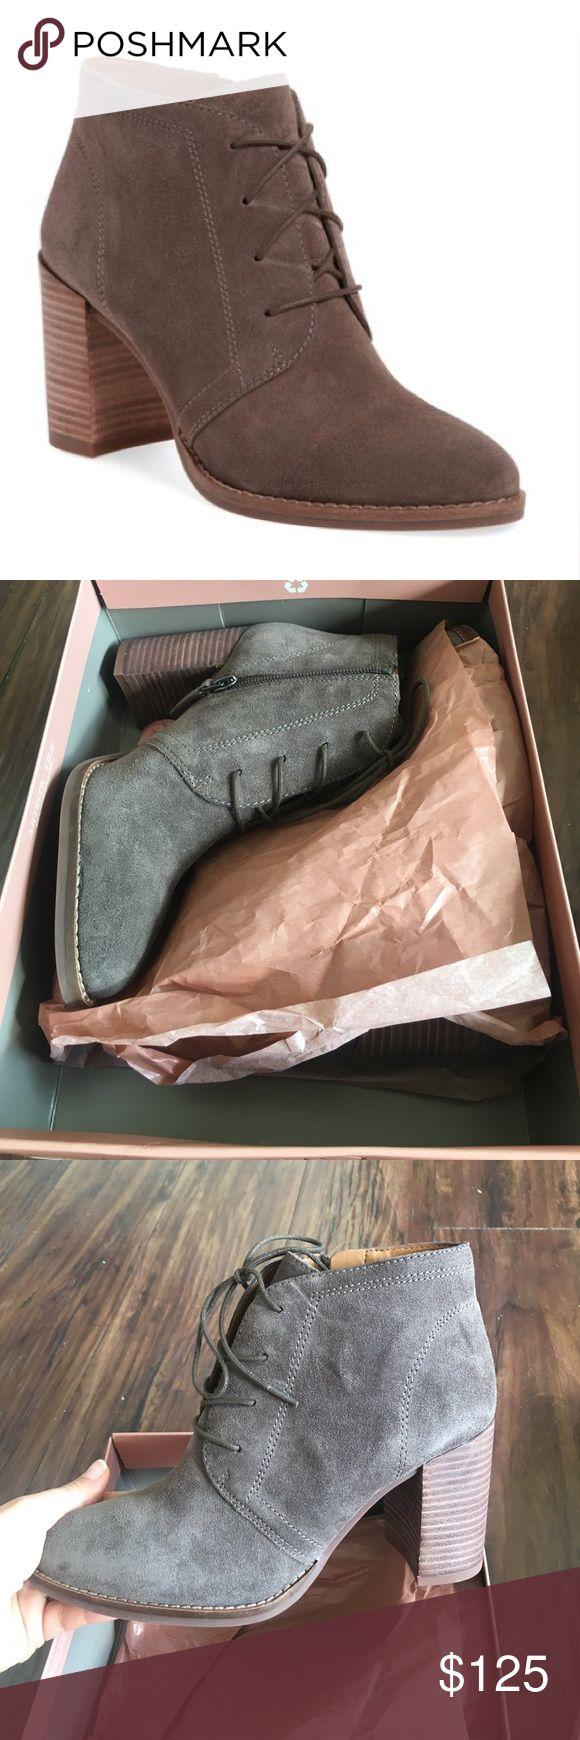 Spotted while shopping on Poshmark: Franco Sarto A-Omari Bootie! #poshmark #fashion #shopping #style #Franco Sarto #Shoes